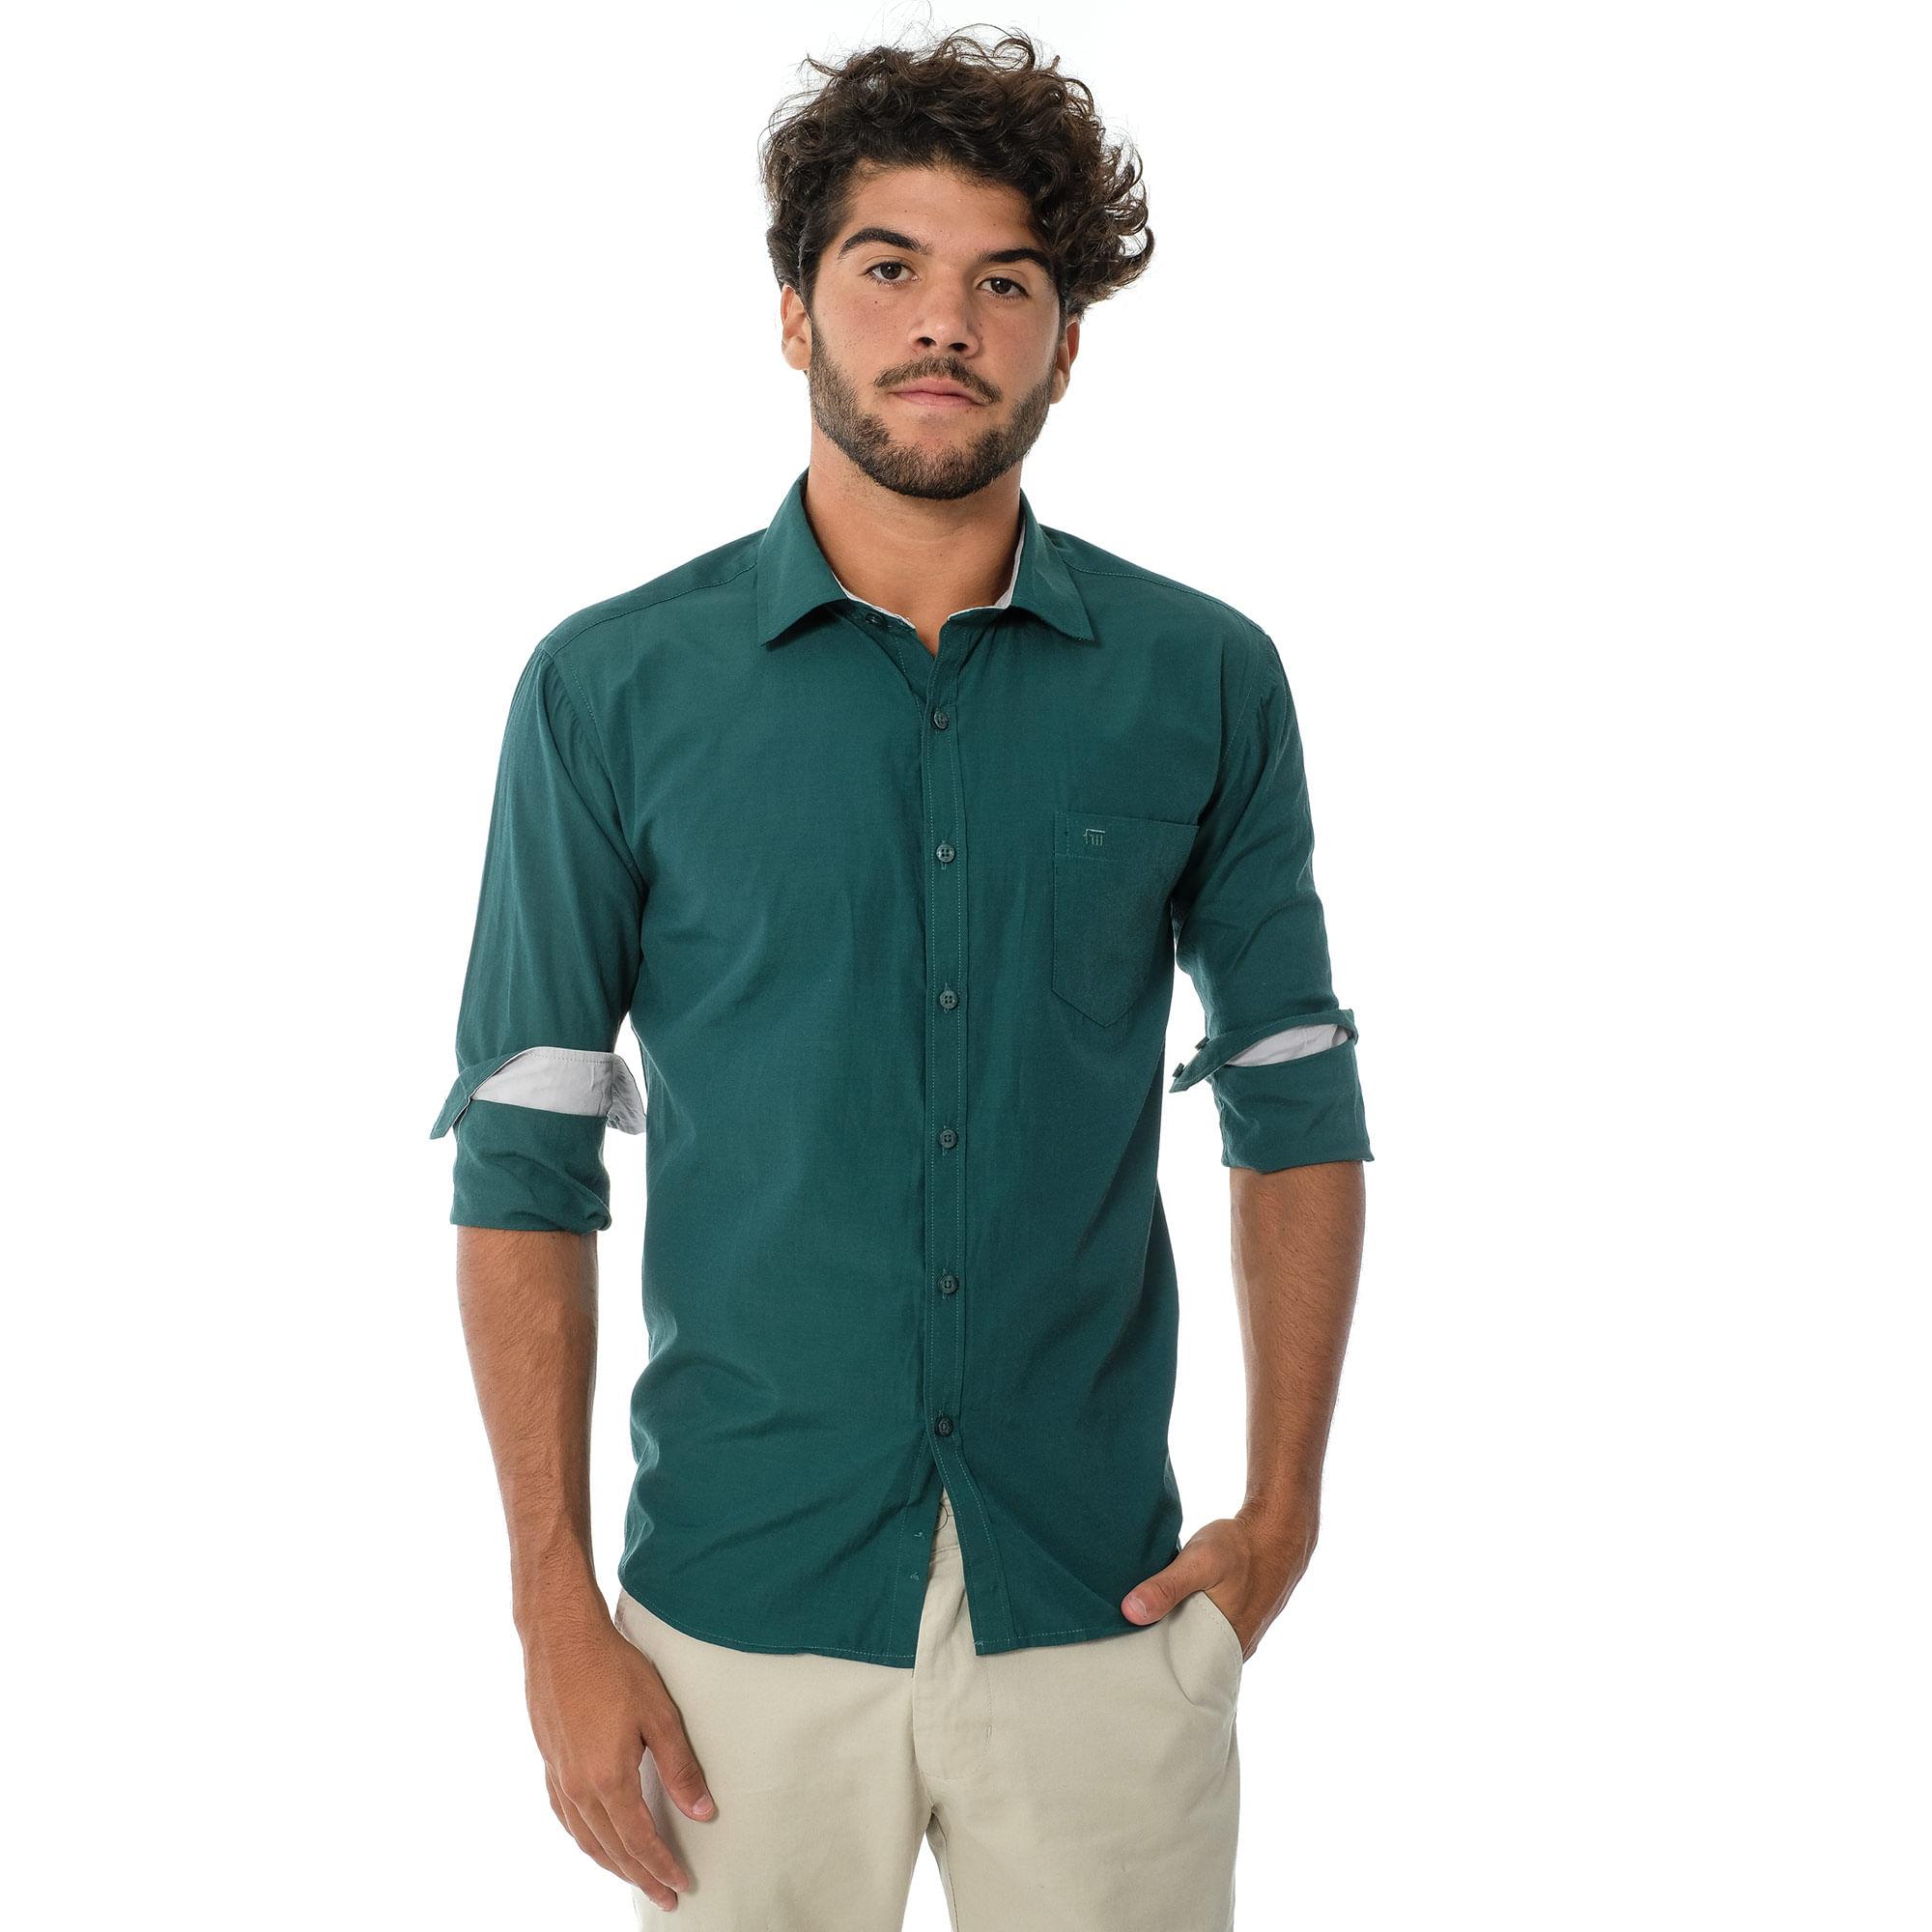 6d18ae655 Camisa Social ML Lisa - lojafattoamano